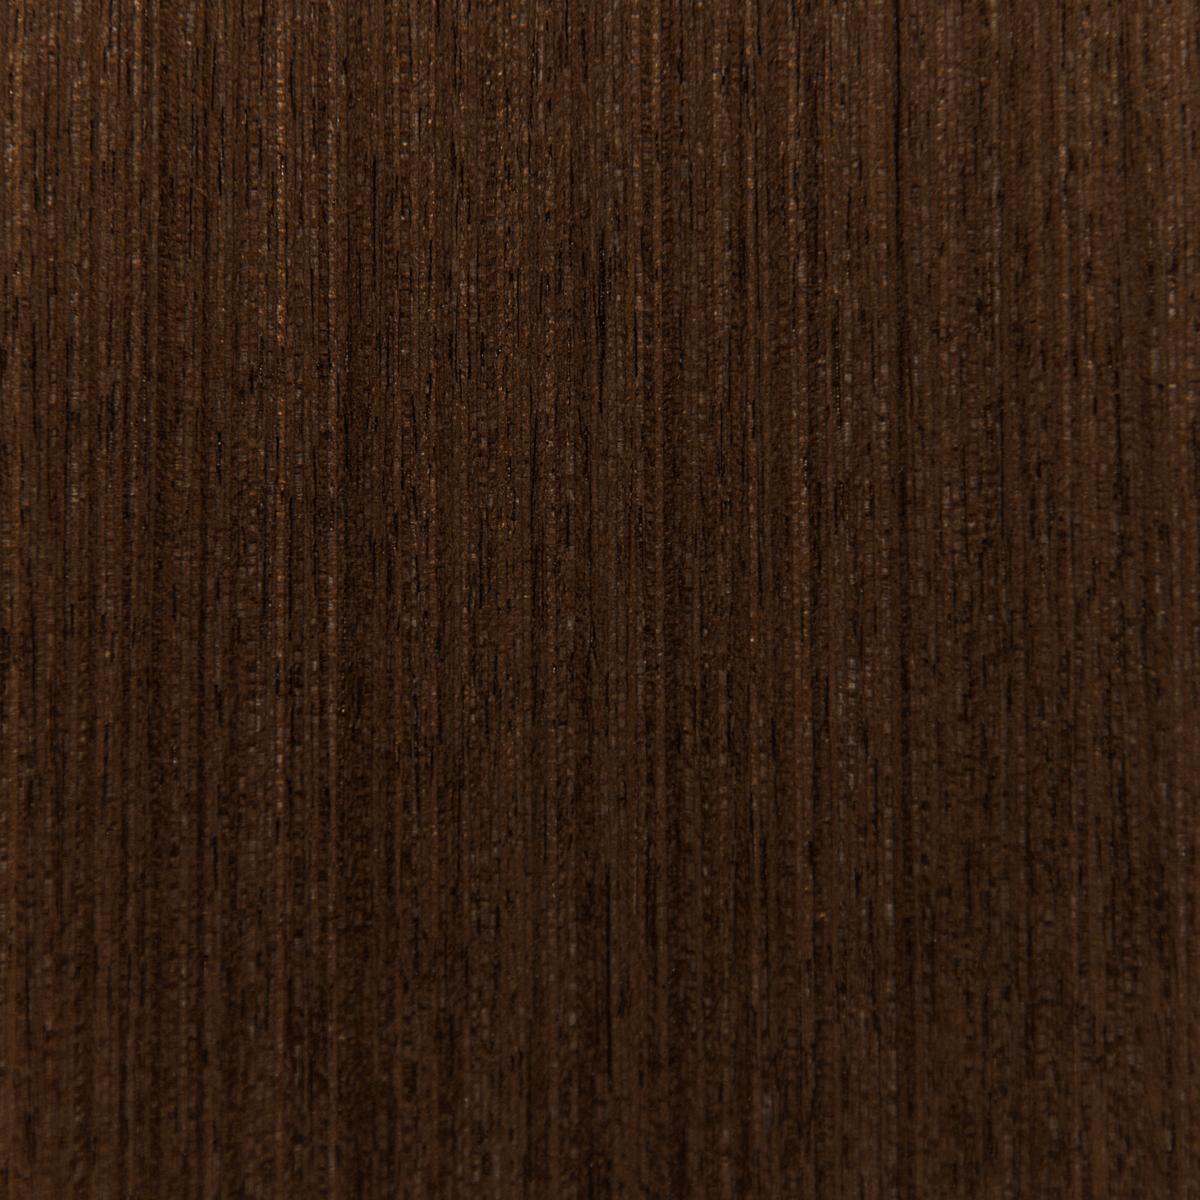 Венге шоколадный под лаком    Артикул:  D20 2V38/V-B1-UV MAGRO   Размер:  2850x615 мм   Цена:  9.05 €/м2